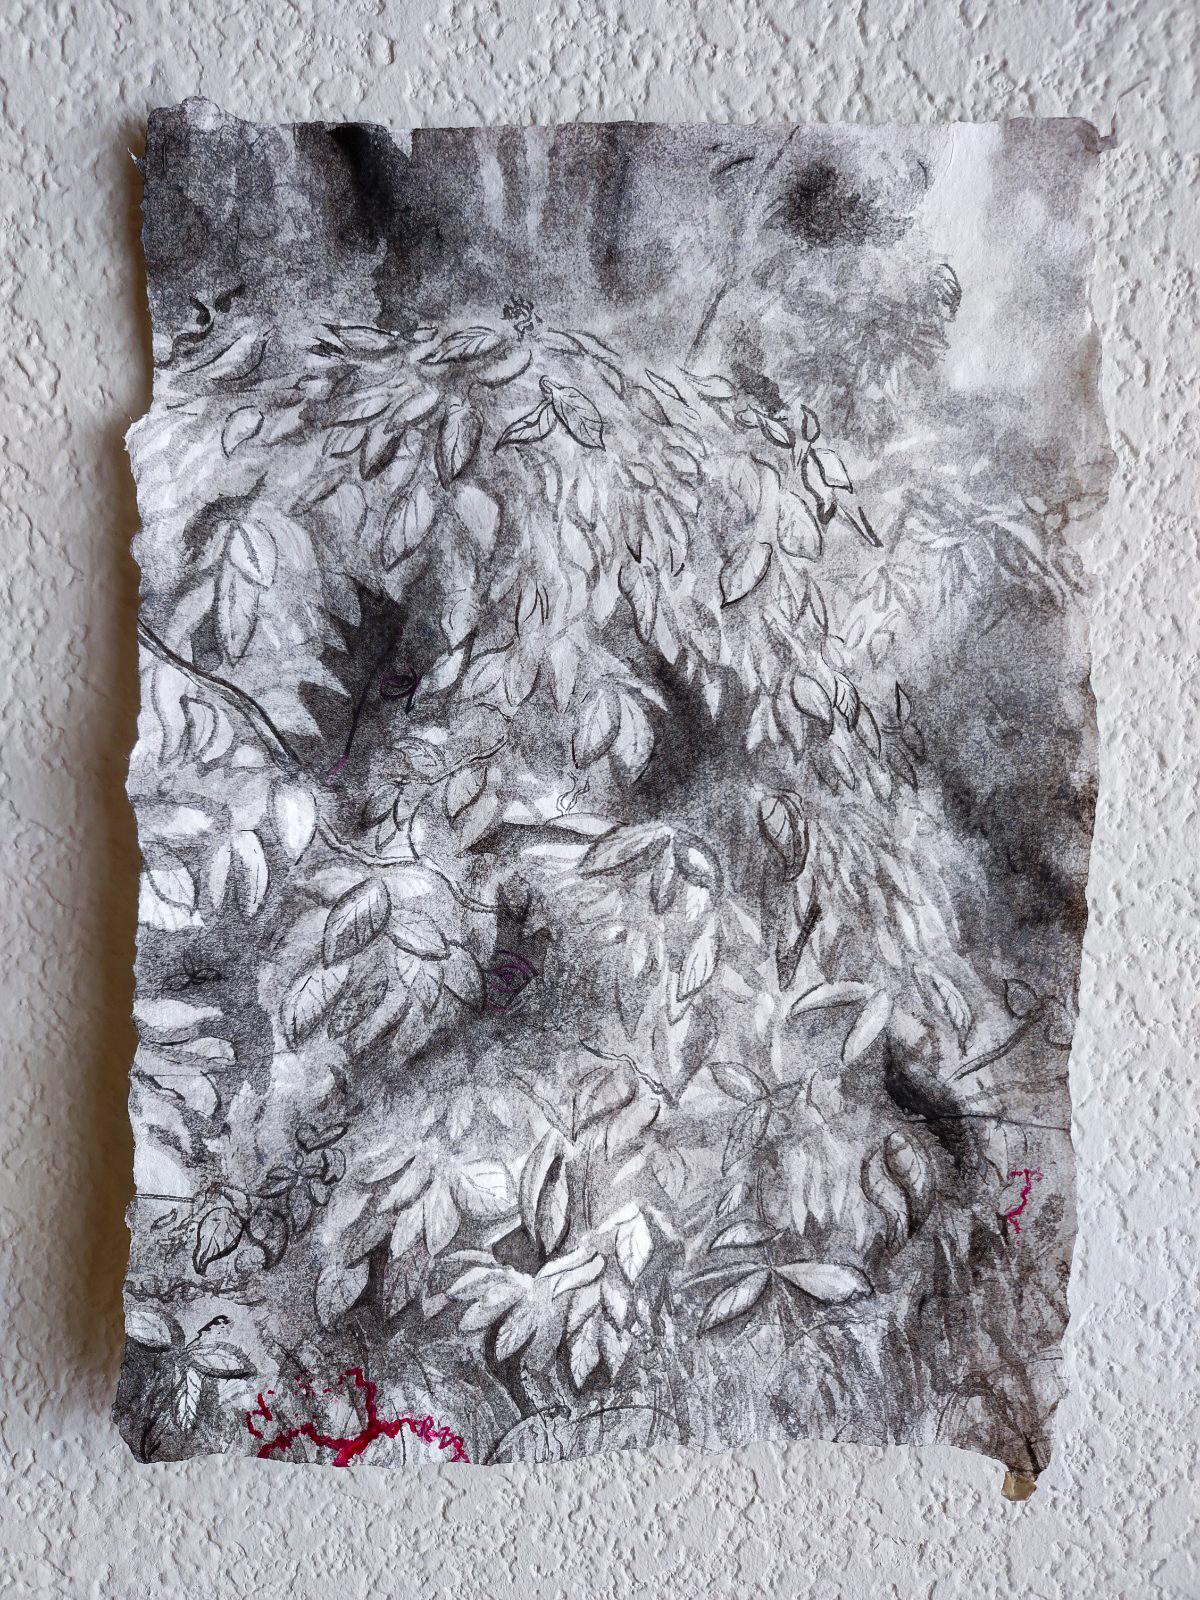 "Jonathan Adams, ""sigh, lost"" (2020) 8"" x 12.5"", ink on paper"